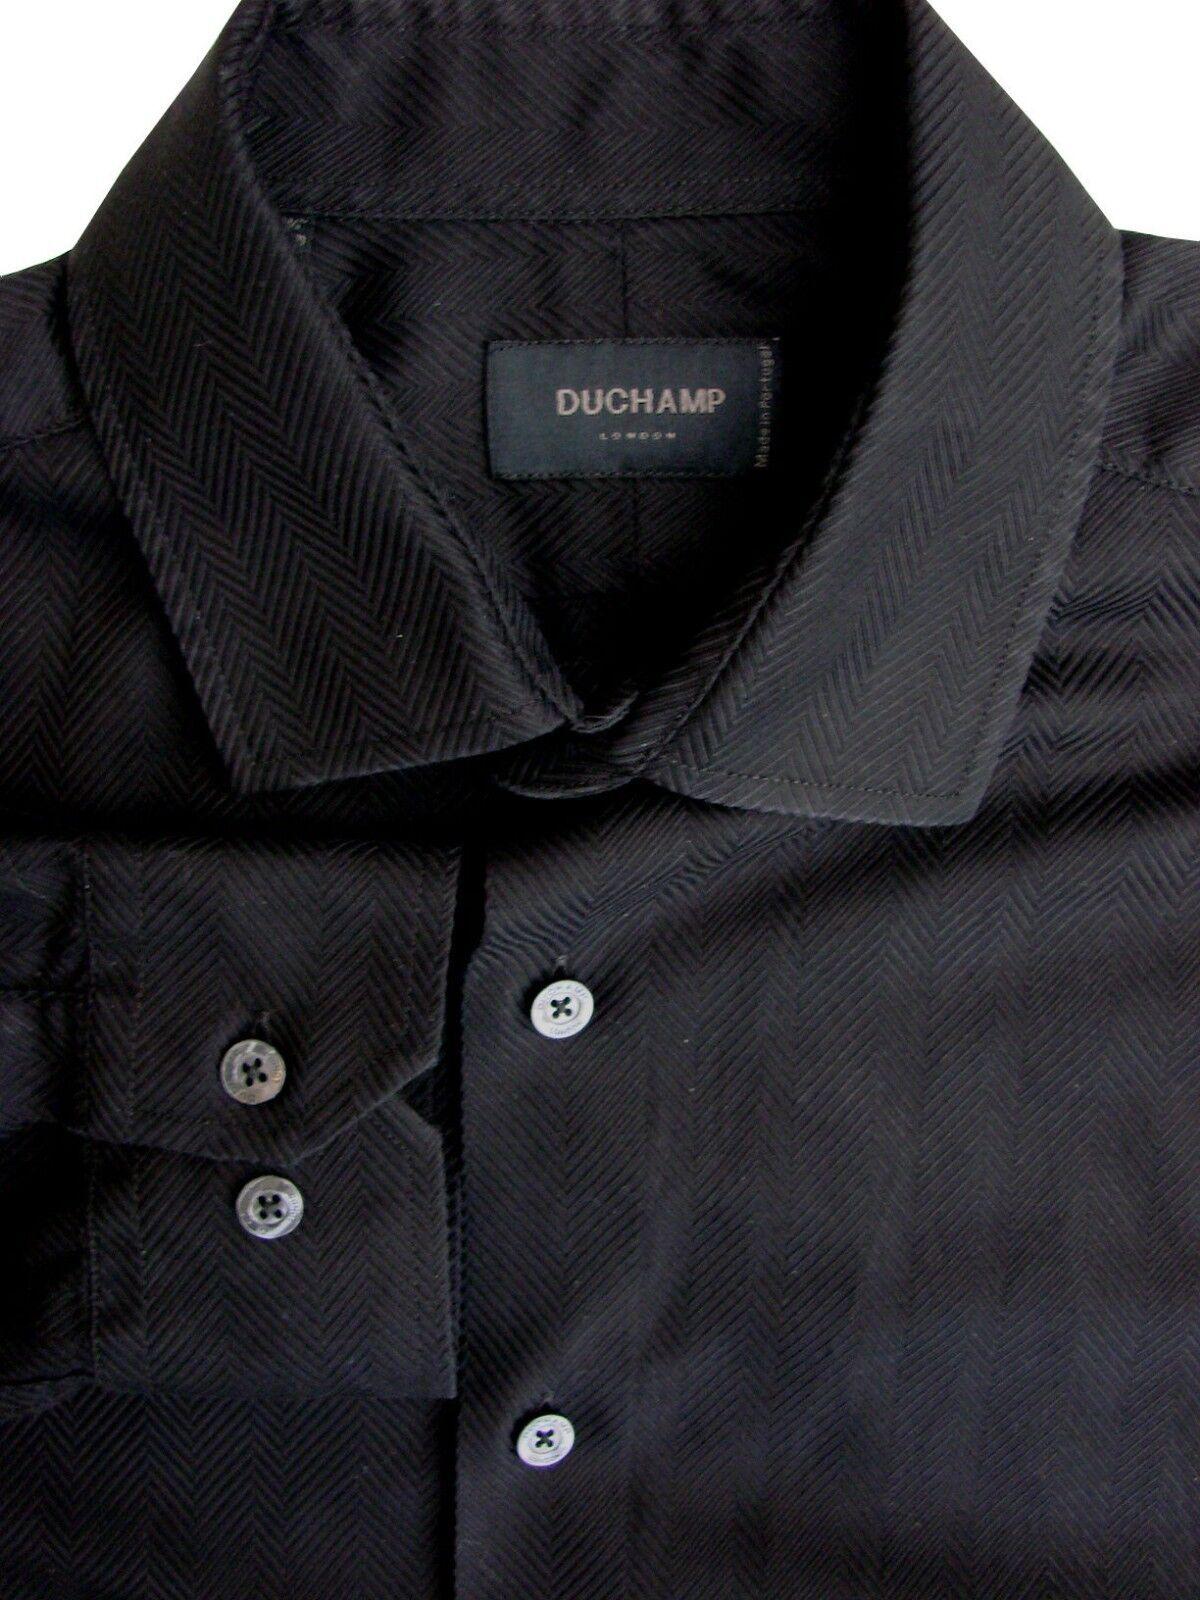 Duchamp London Camicia Da Uomo 16 M STRISCE NERE spina di pesce